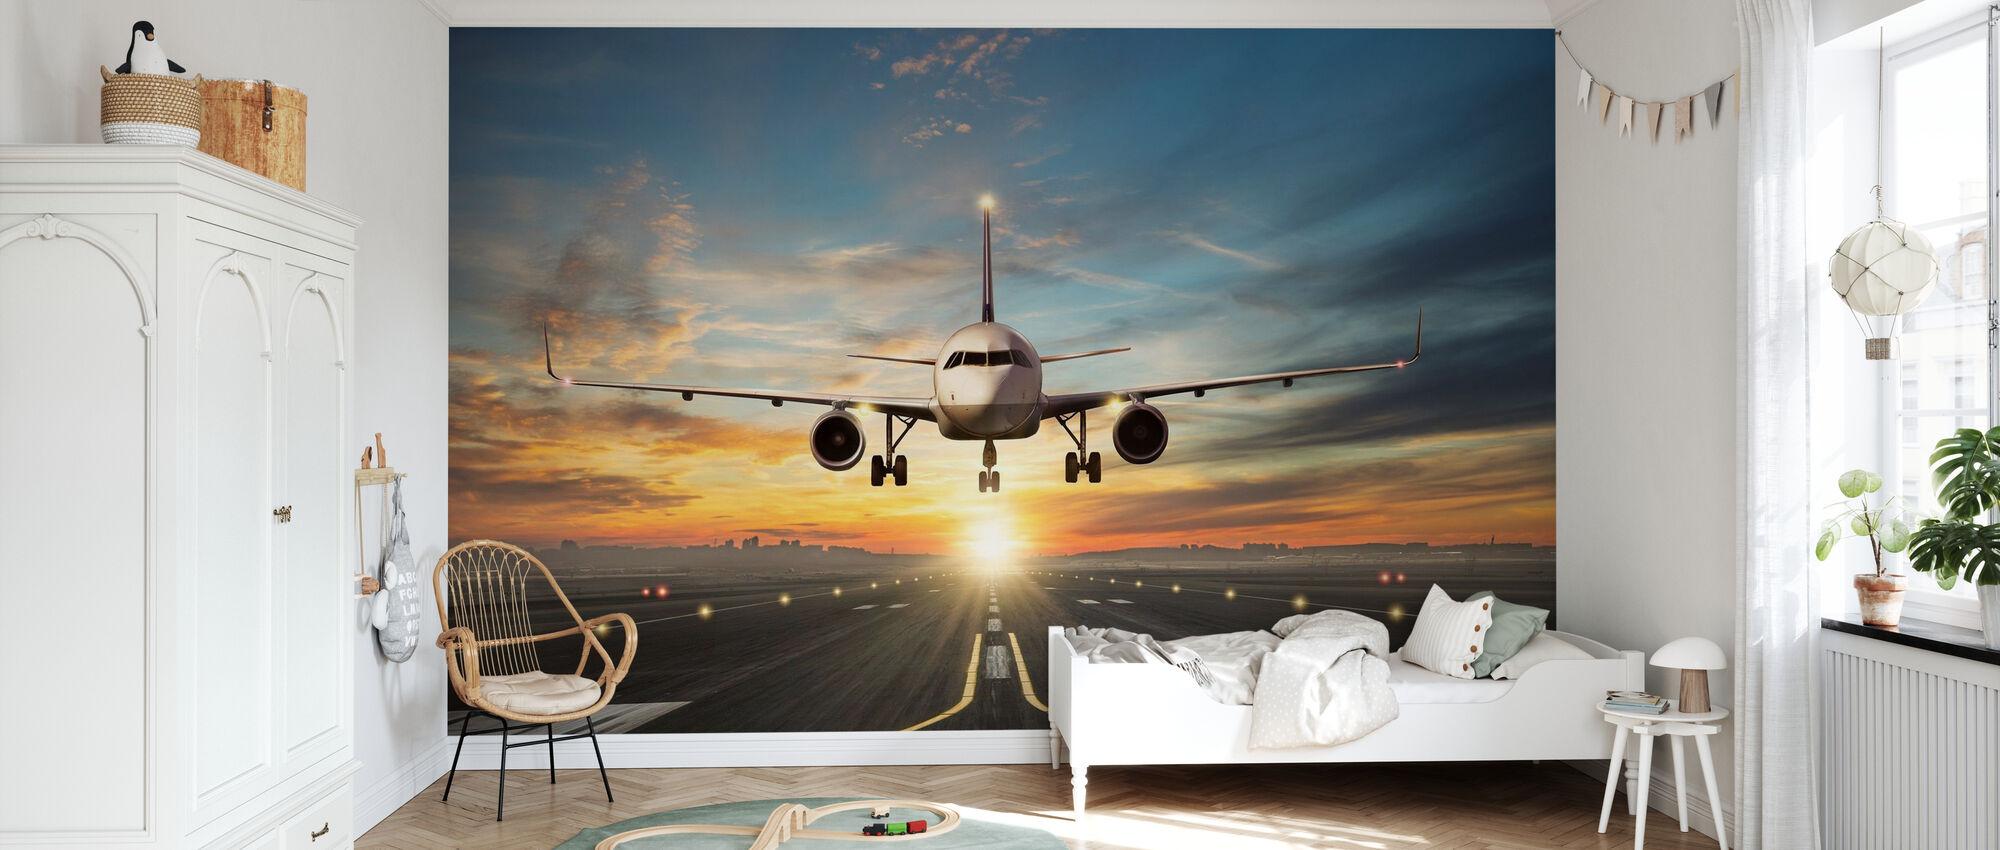 Sunset Inflight - Wallpaper - Kids Room